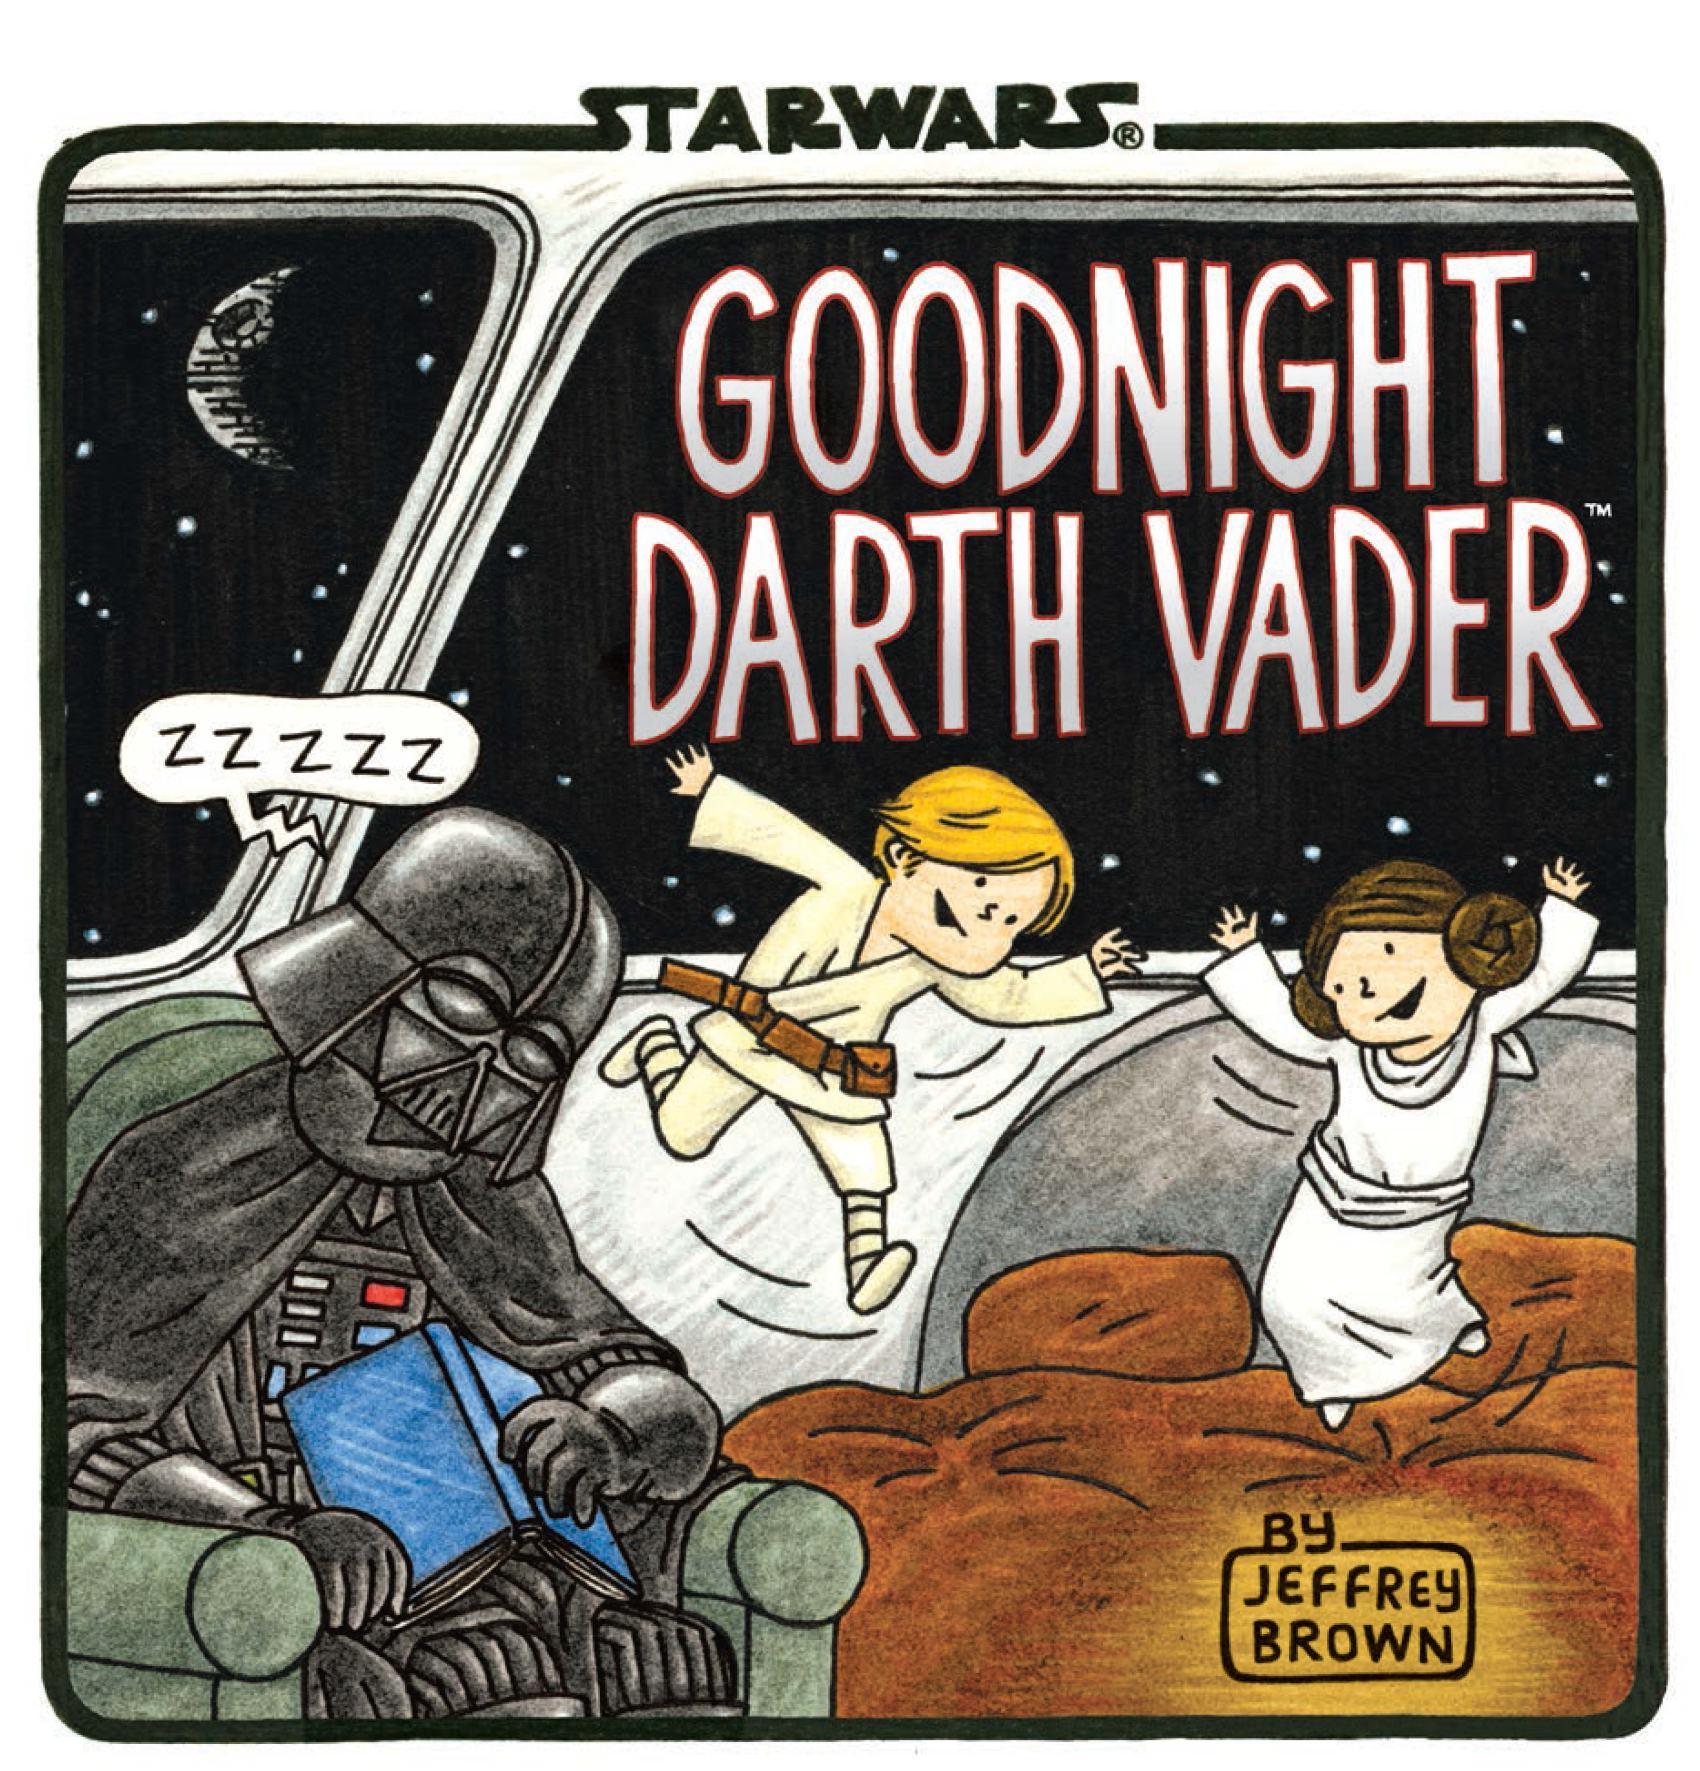 """Goodnight Darth Vader"" by Jeffrey Brown."